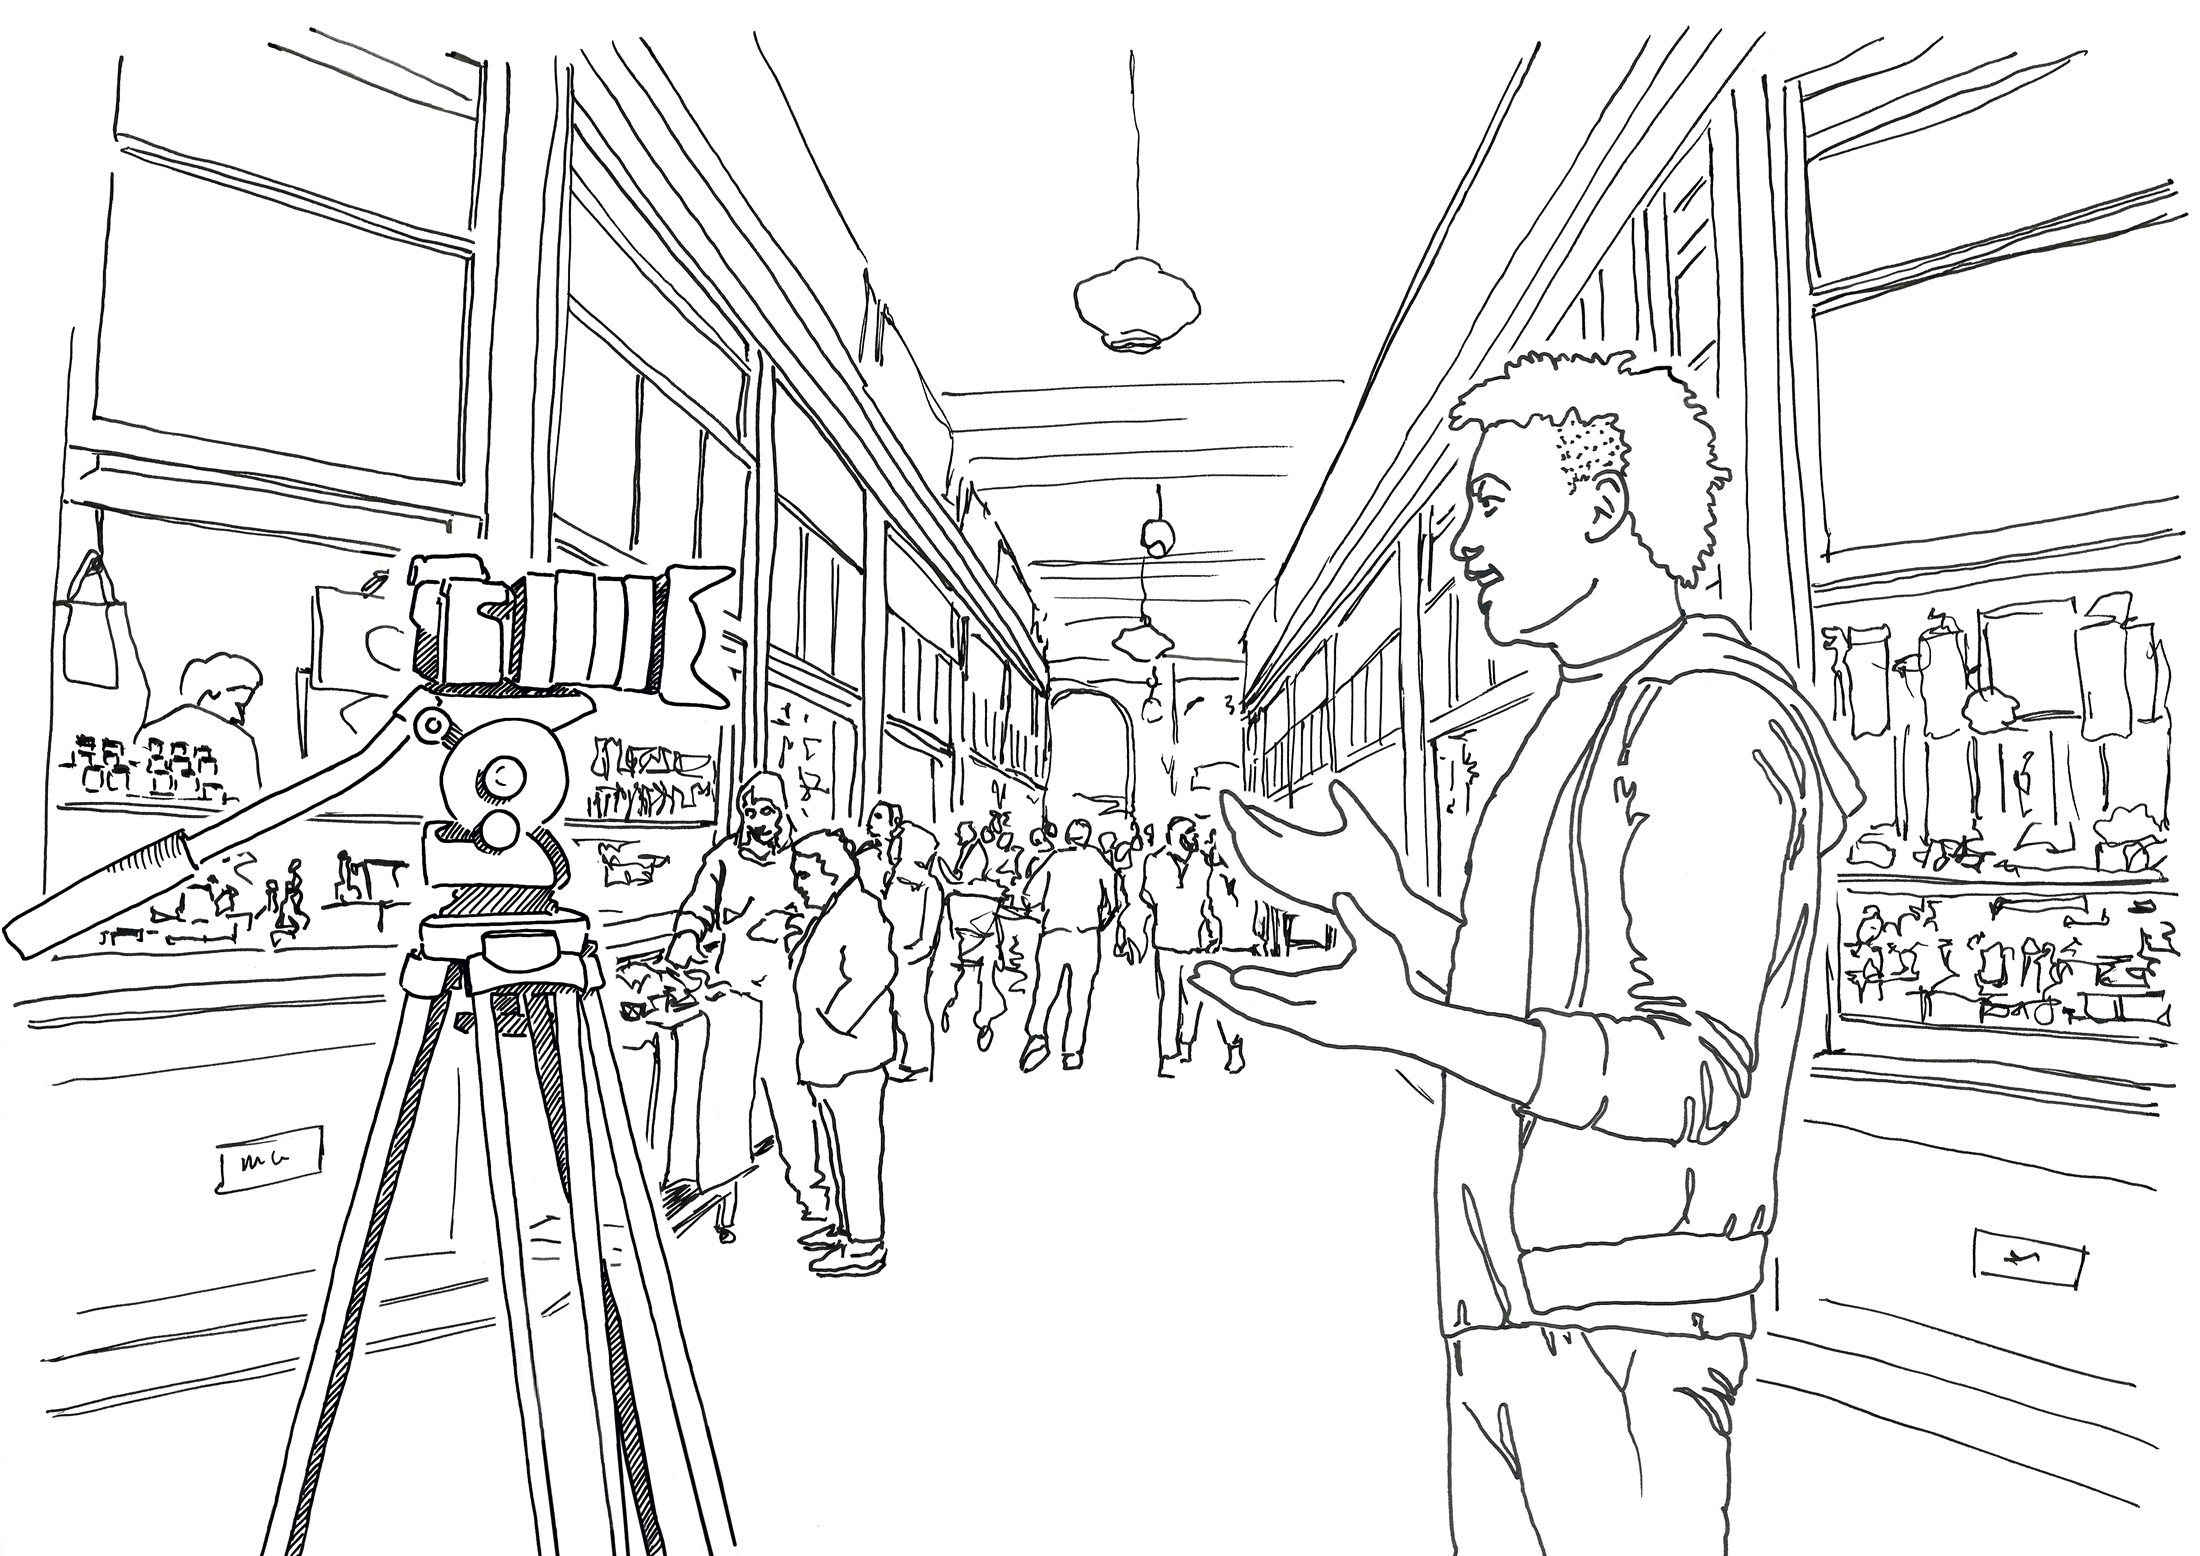 Illustration of market setting, camera with no mic setup